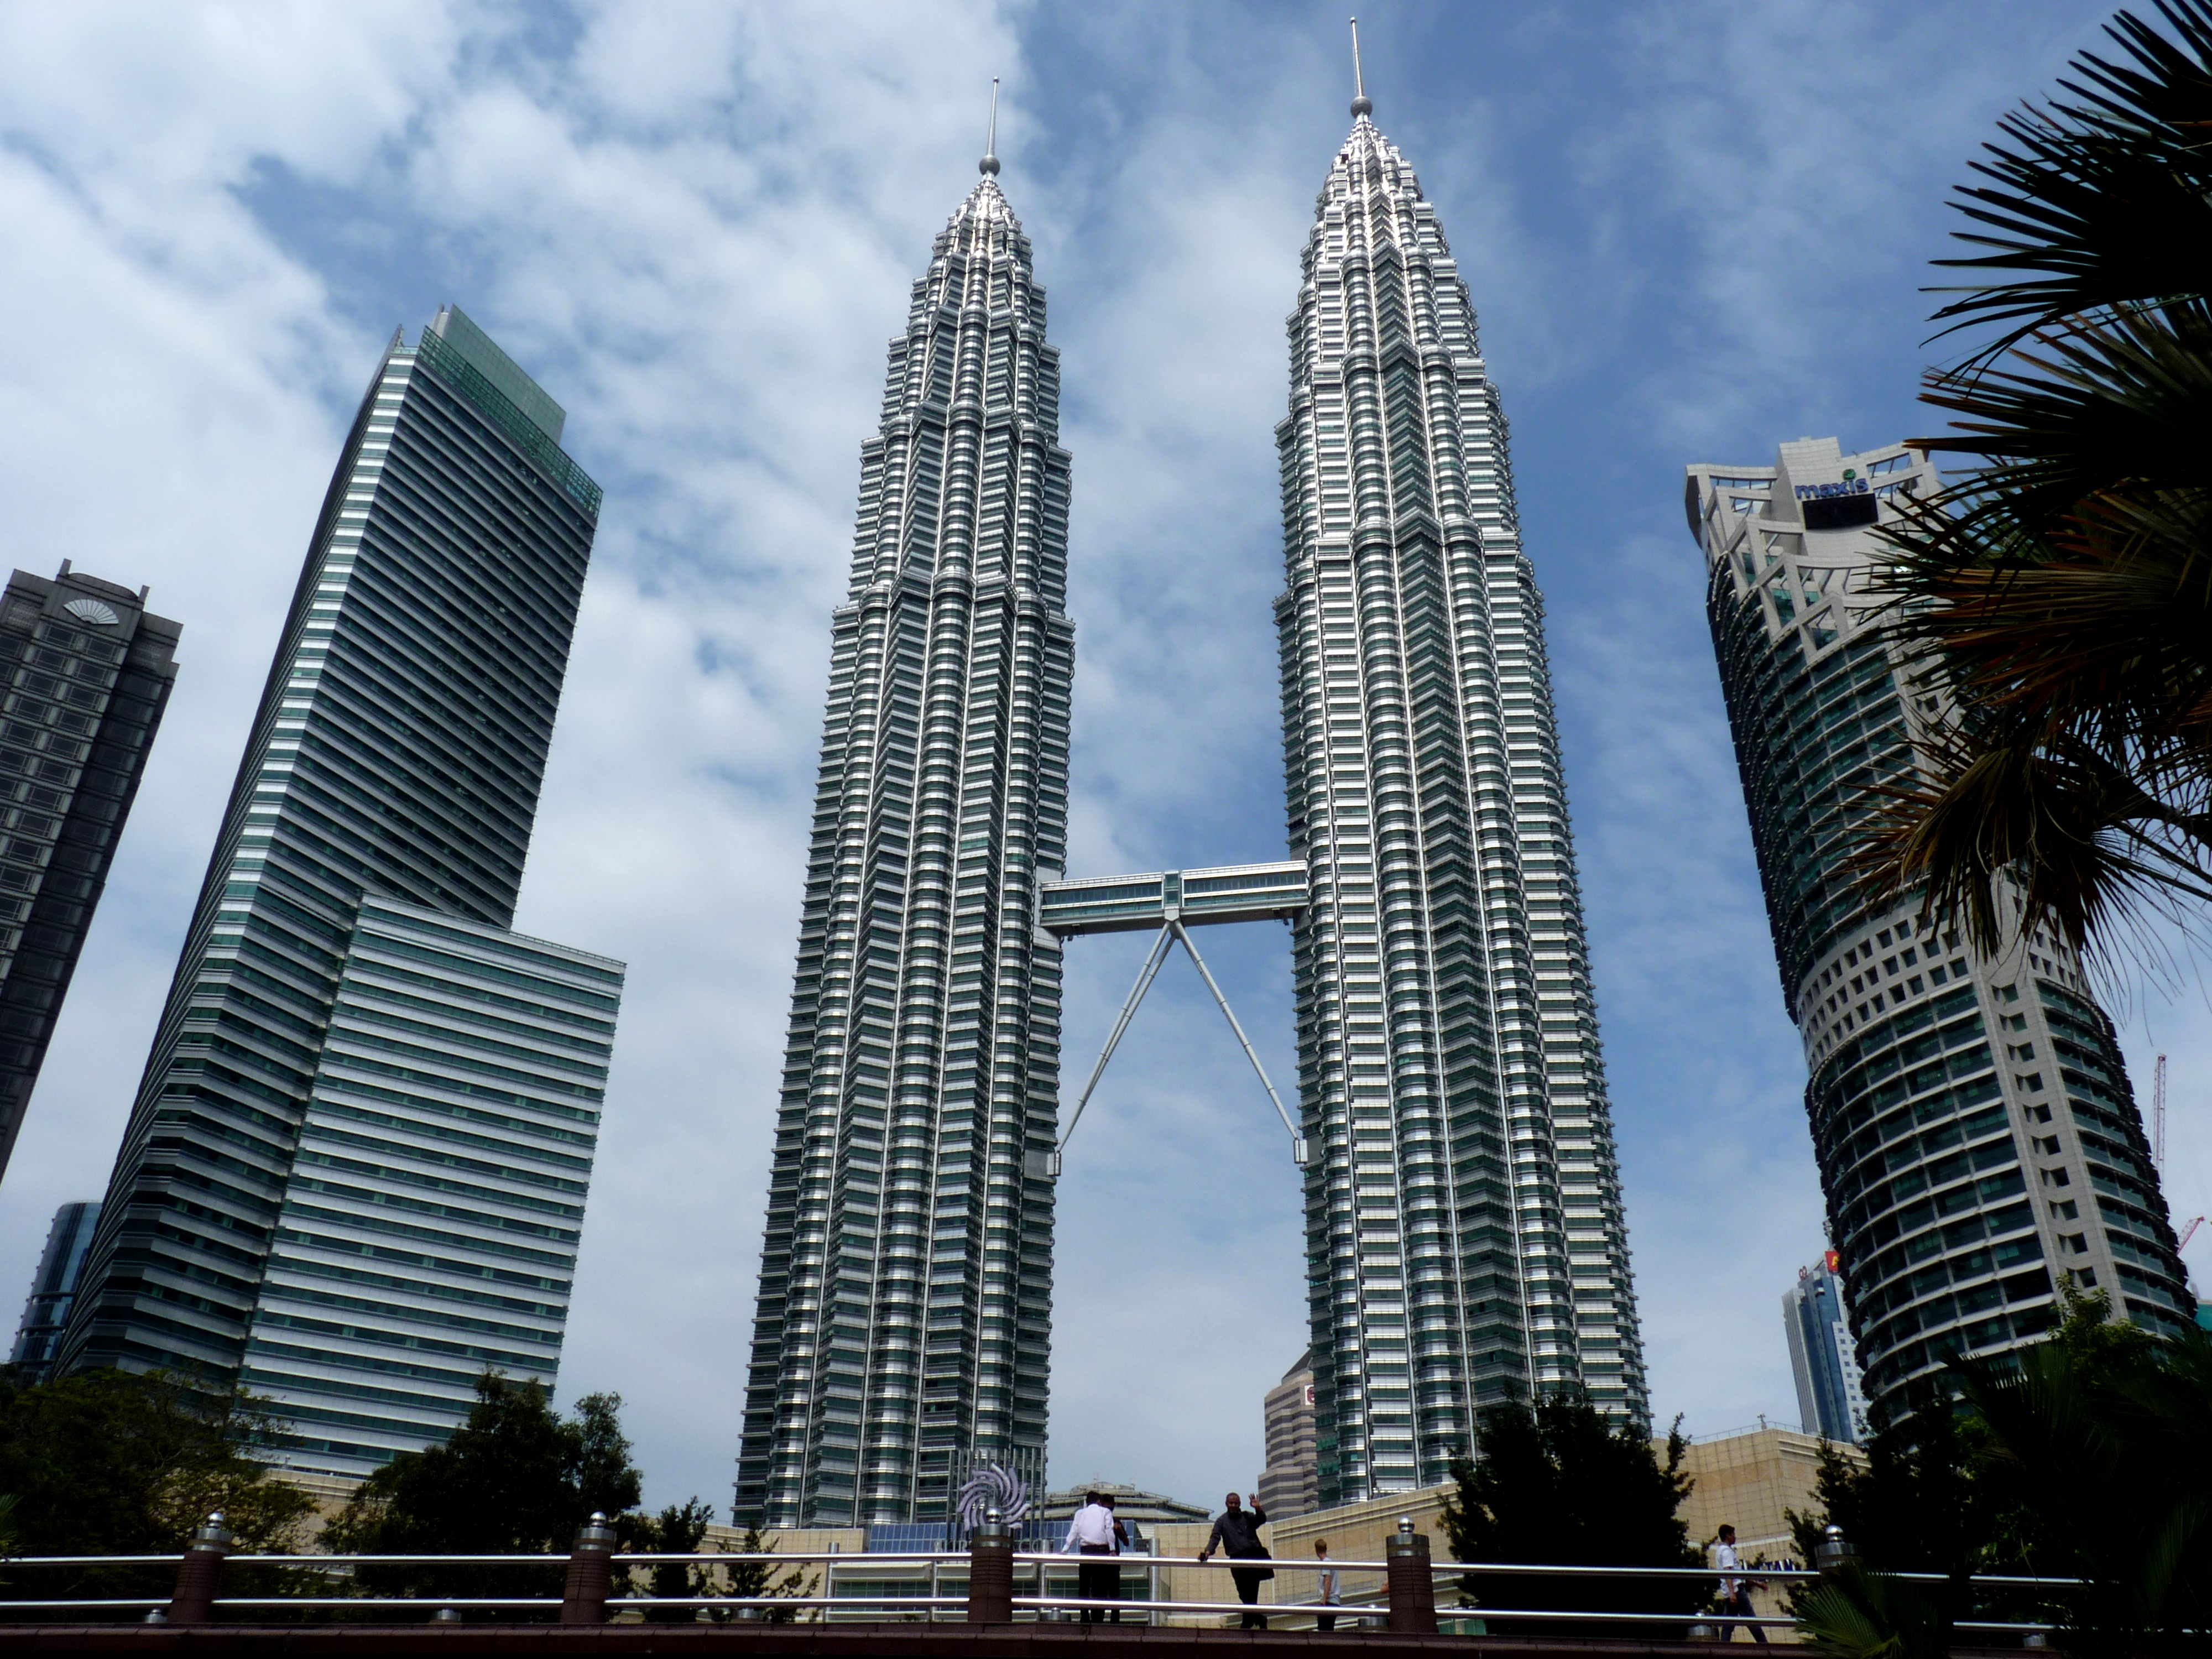 Kuala Lumpur Malaysia  city photo : Description The Petronas Twin Towers in Kuala Lumpur Malaysia